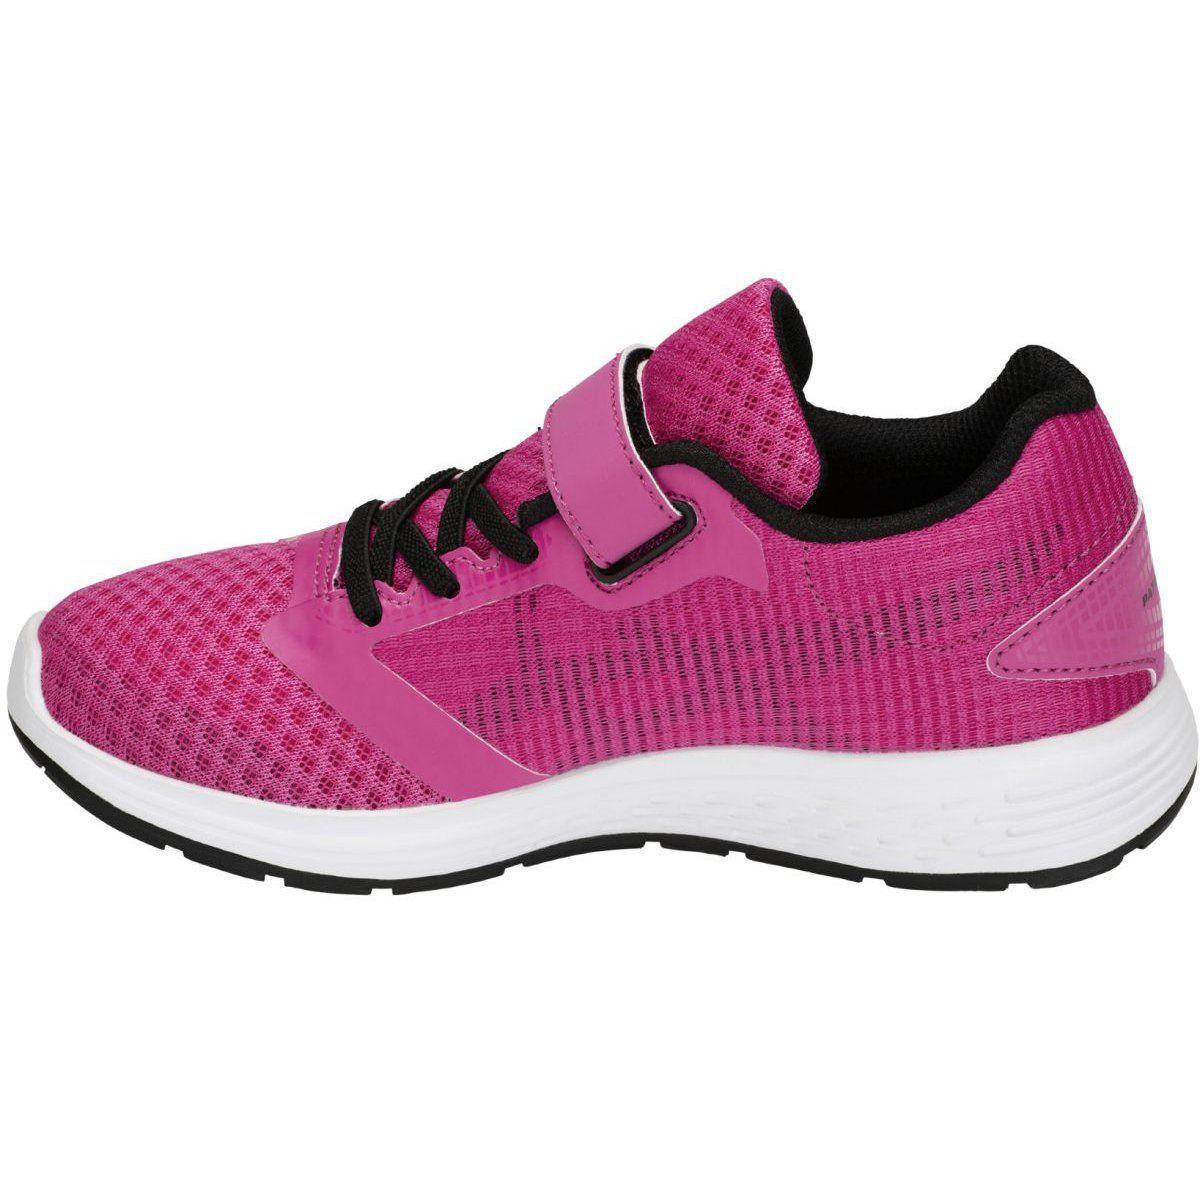 Buty Biegowe Asics Patriot 10 Ps Jr 1014a026 500 Rozowe Asics Running Shoes Running Shoes Girls Shoes